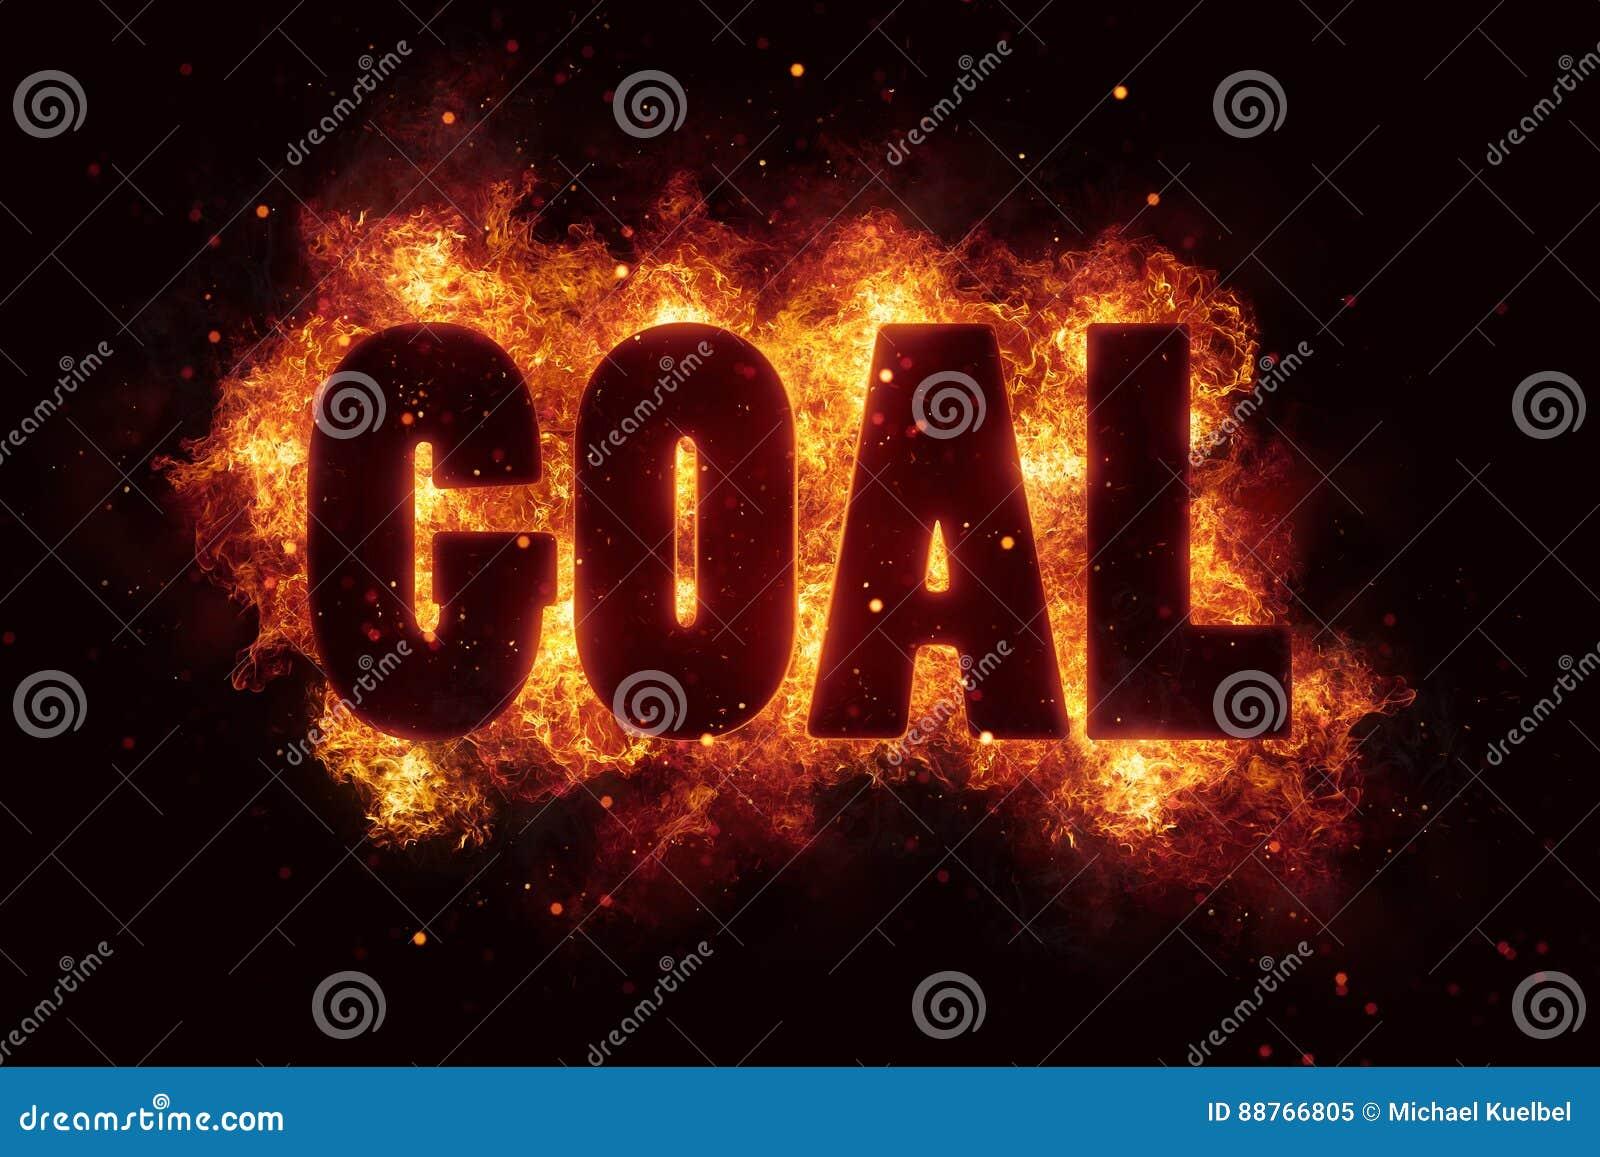 Goal fire text flame flames burn burning hot explosion stock goal fire text flame flames burn burning hot explosion buycottarizona